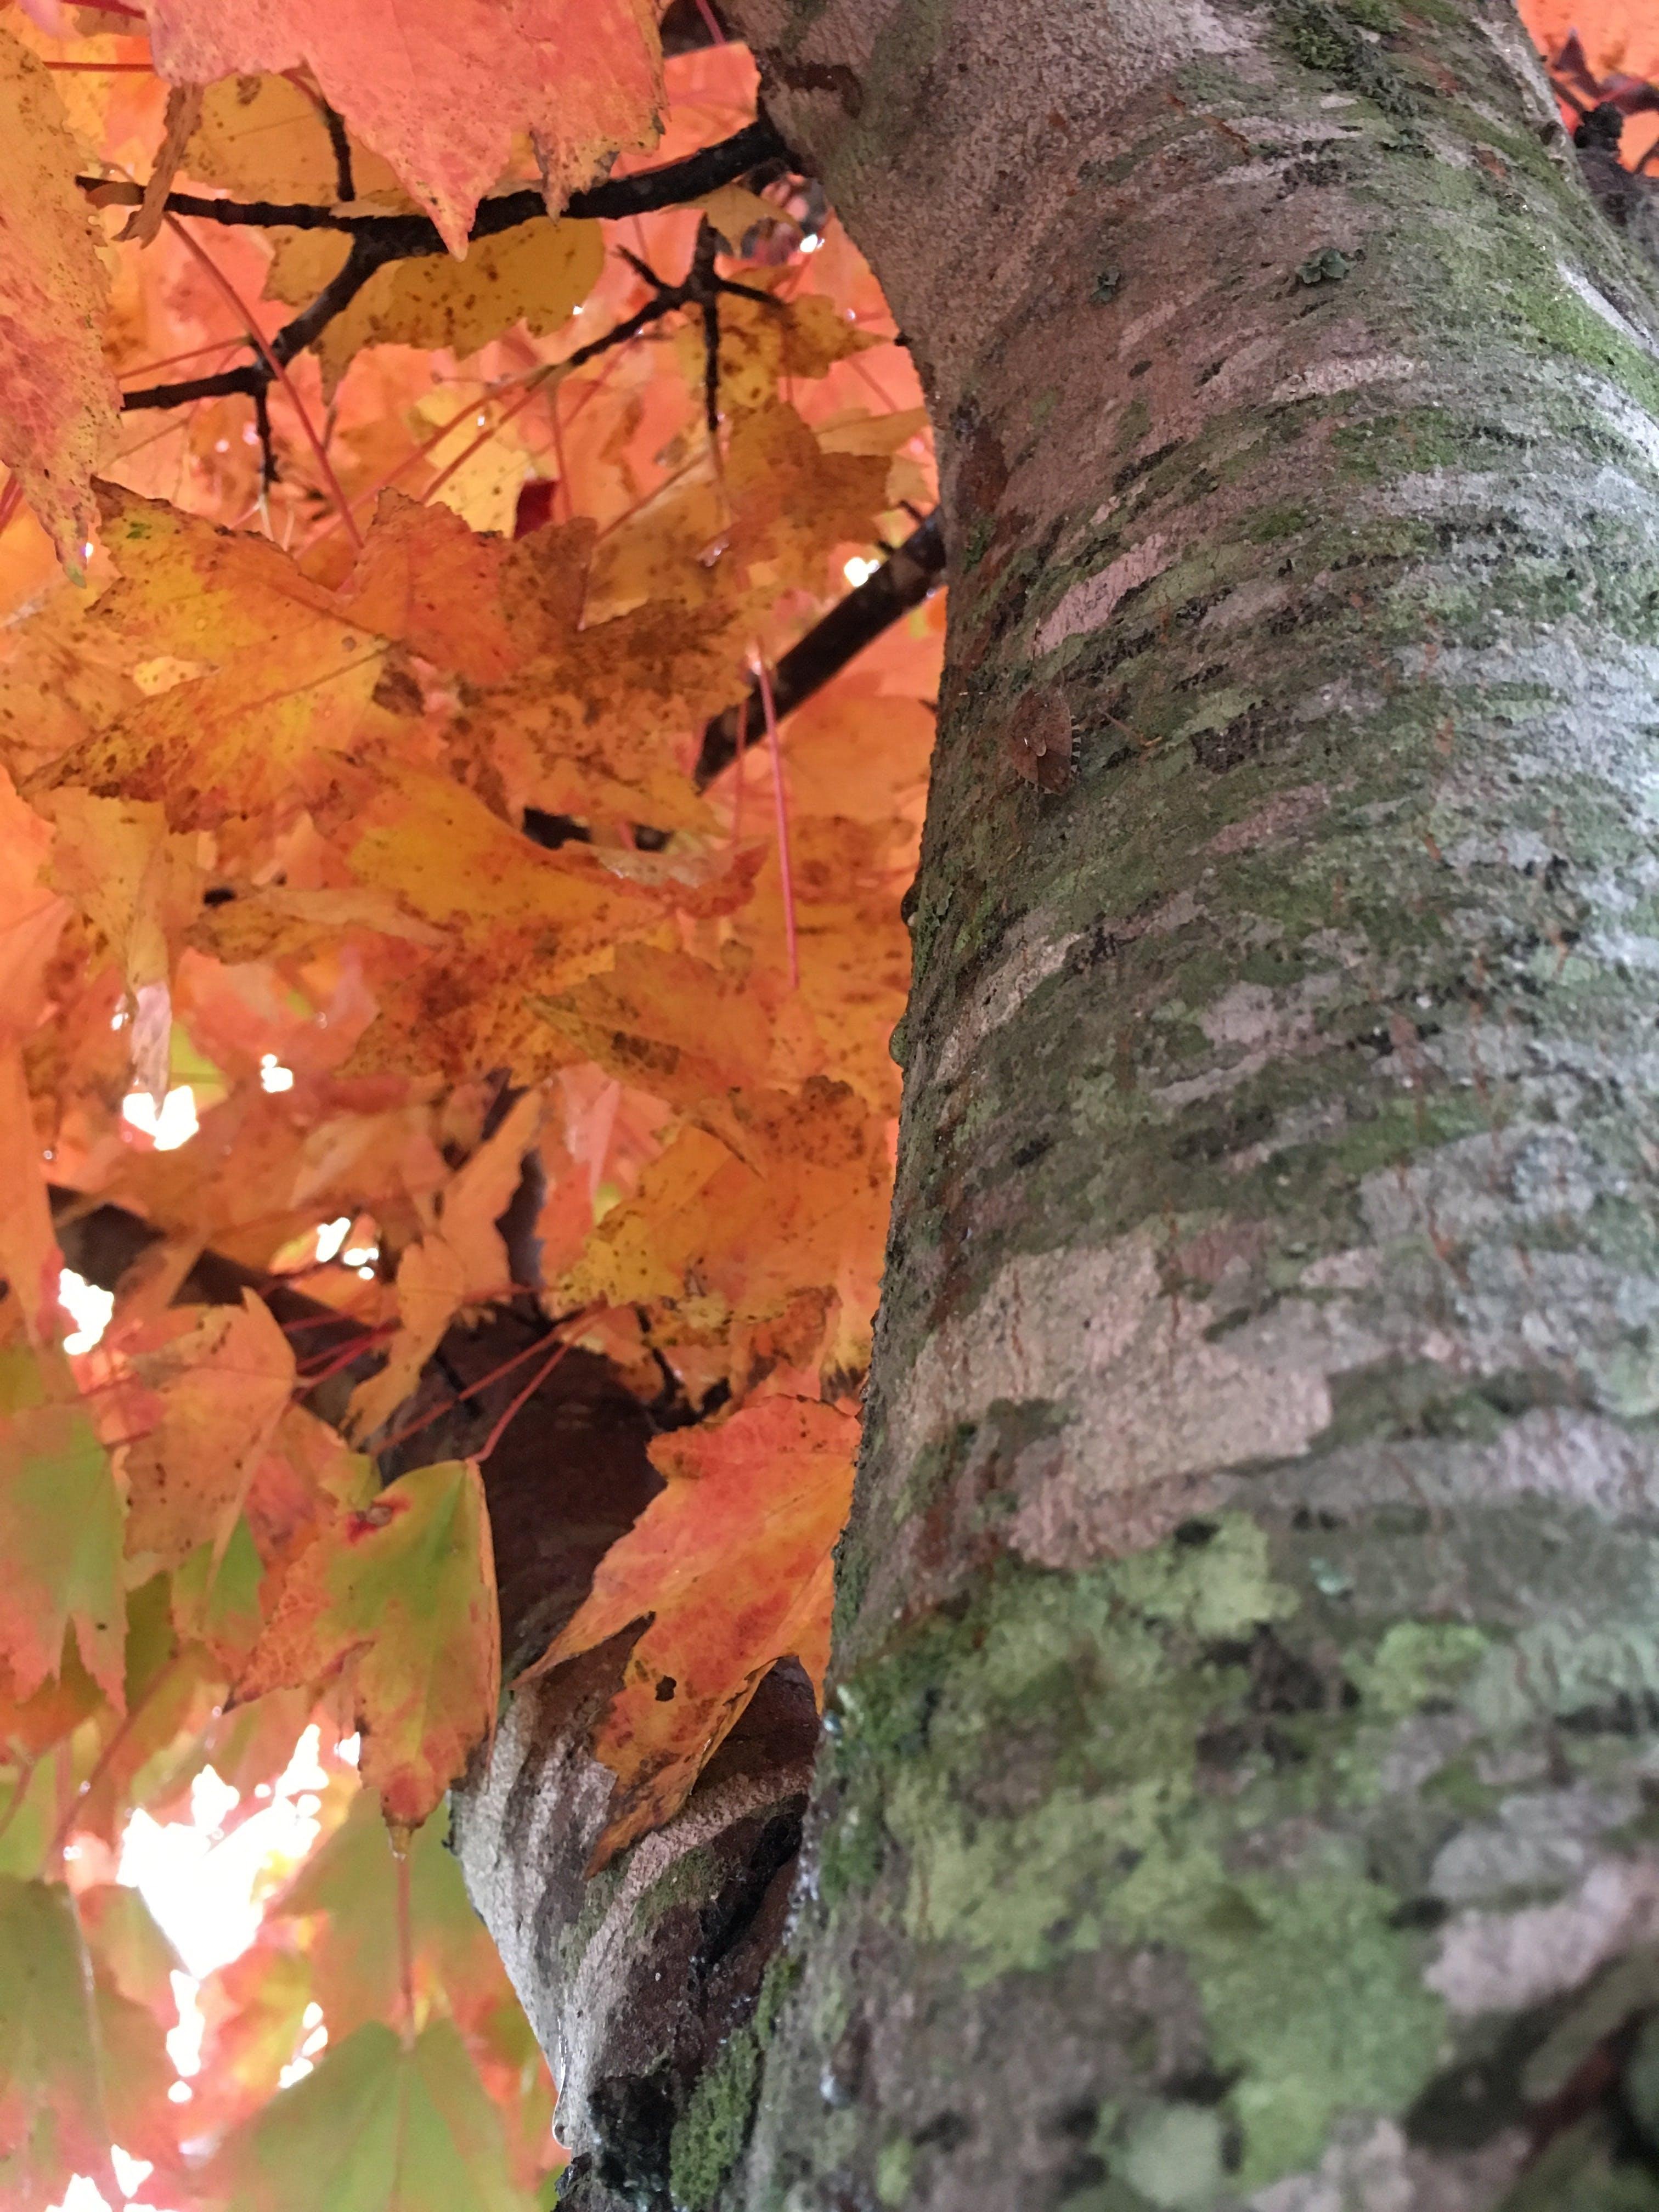 Free stock photo of bark, lichen, orange leaves, tree